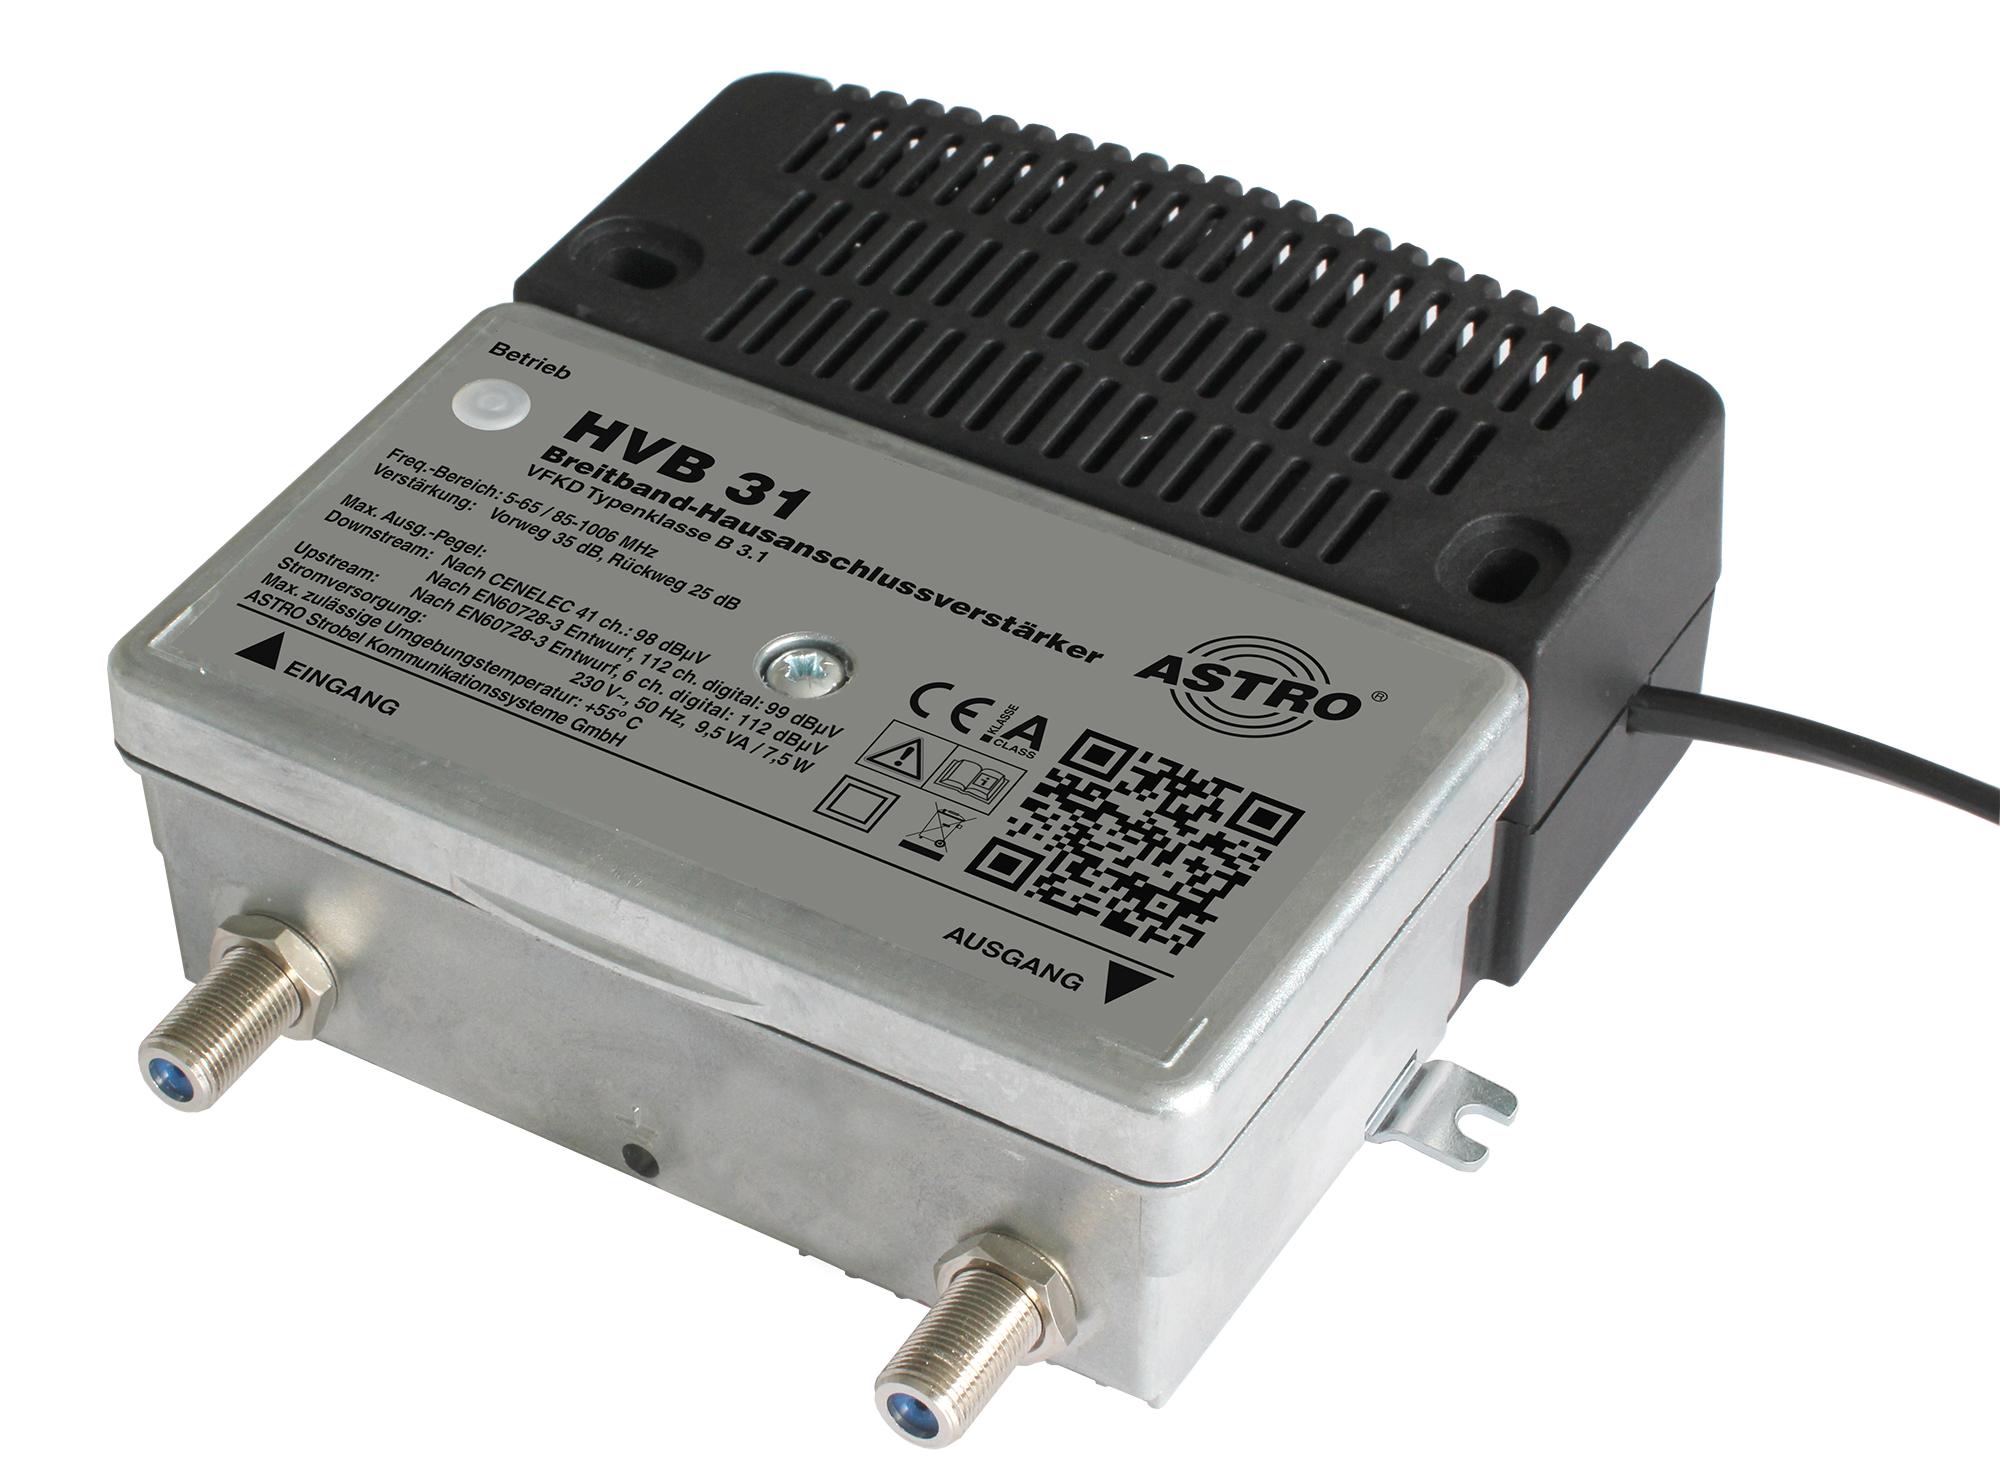 HVB 31 Breitbandverstärker mit 65MHz Rückweg